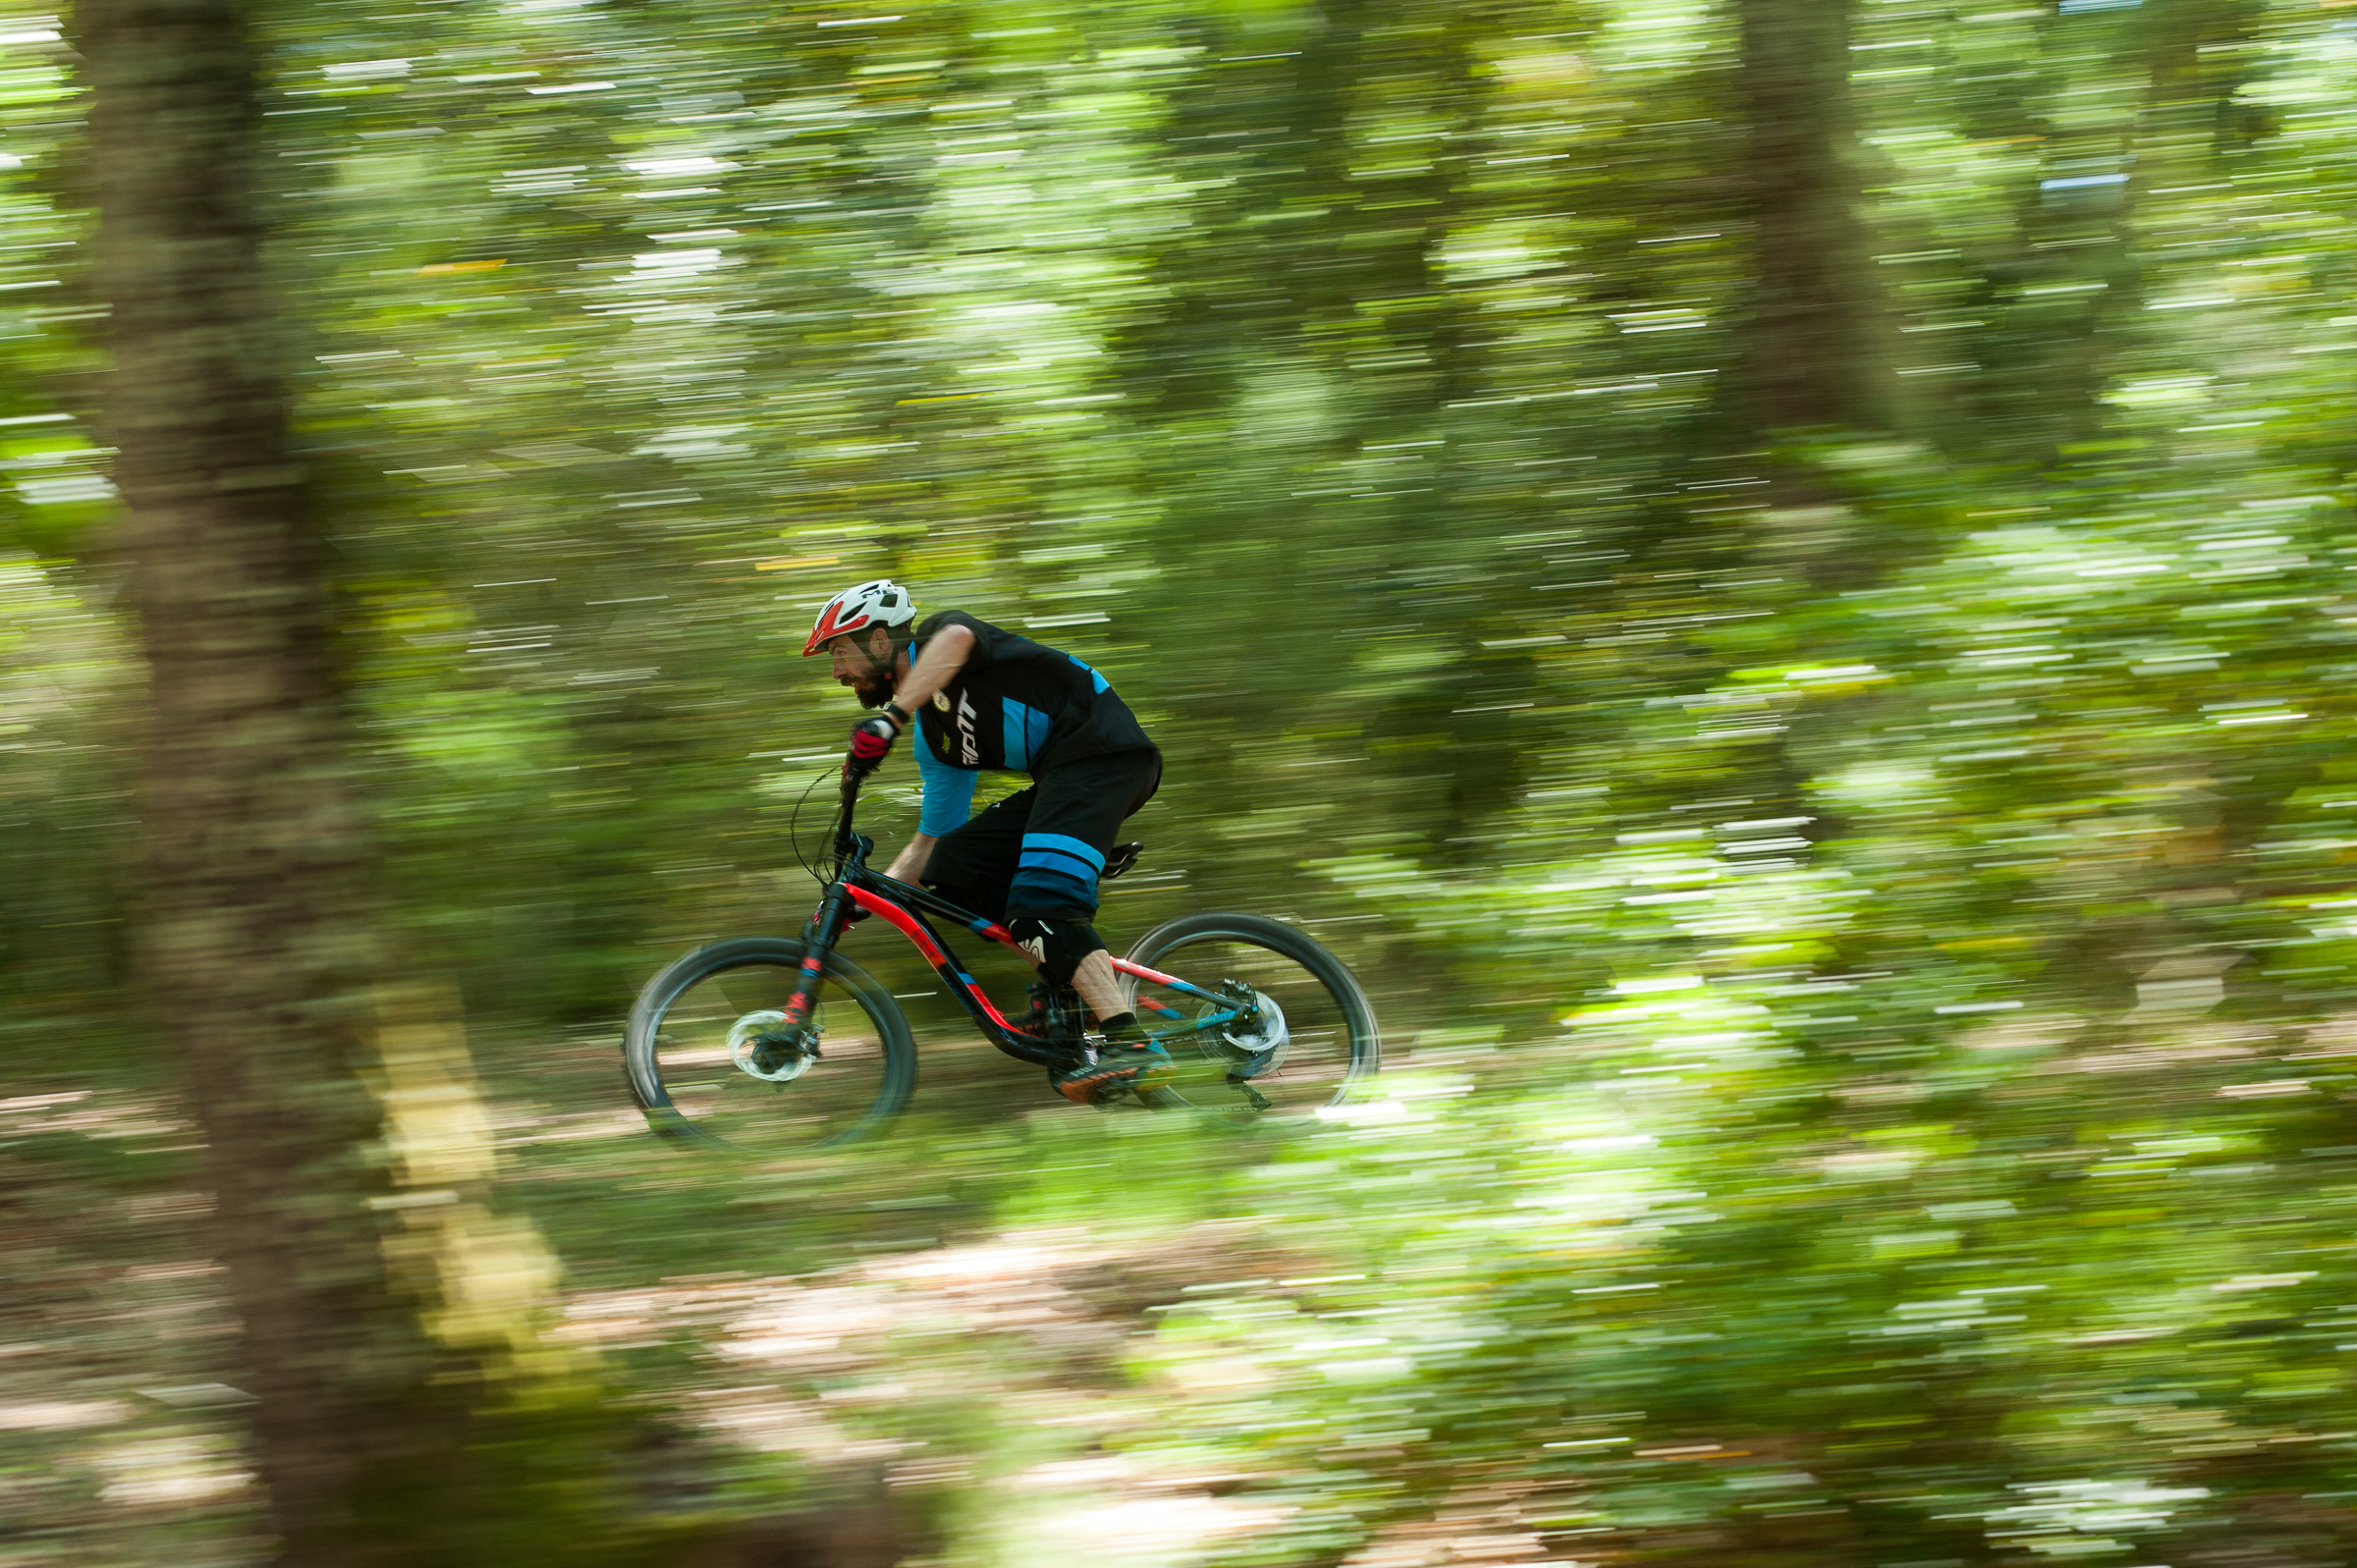 Bibo, guida ed esperto di mountain bike